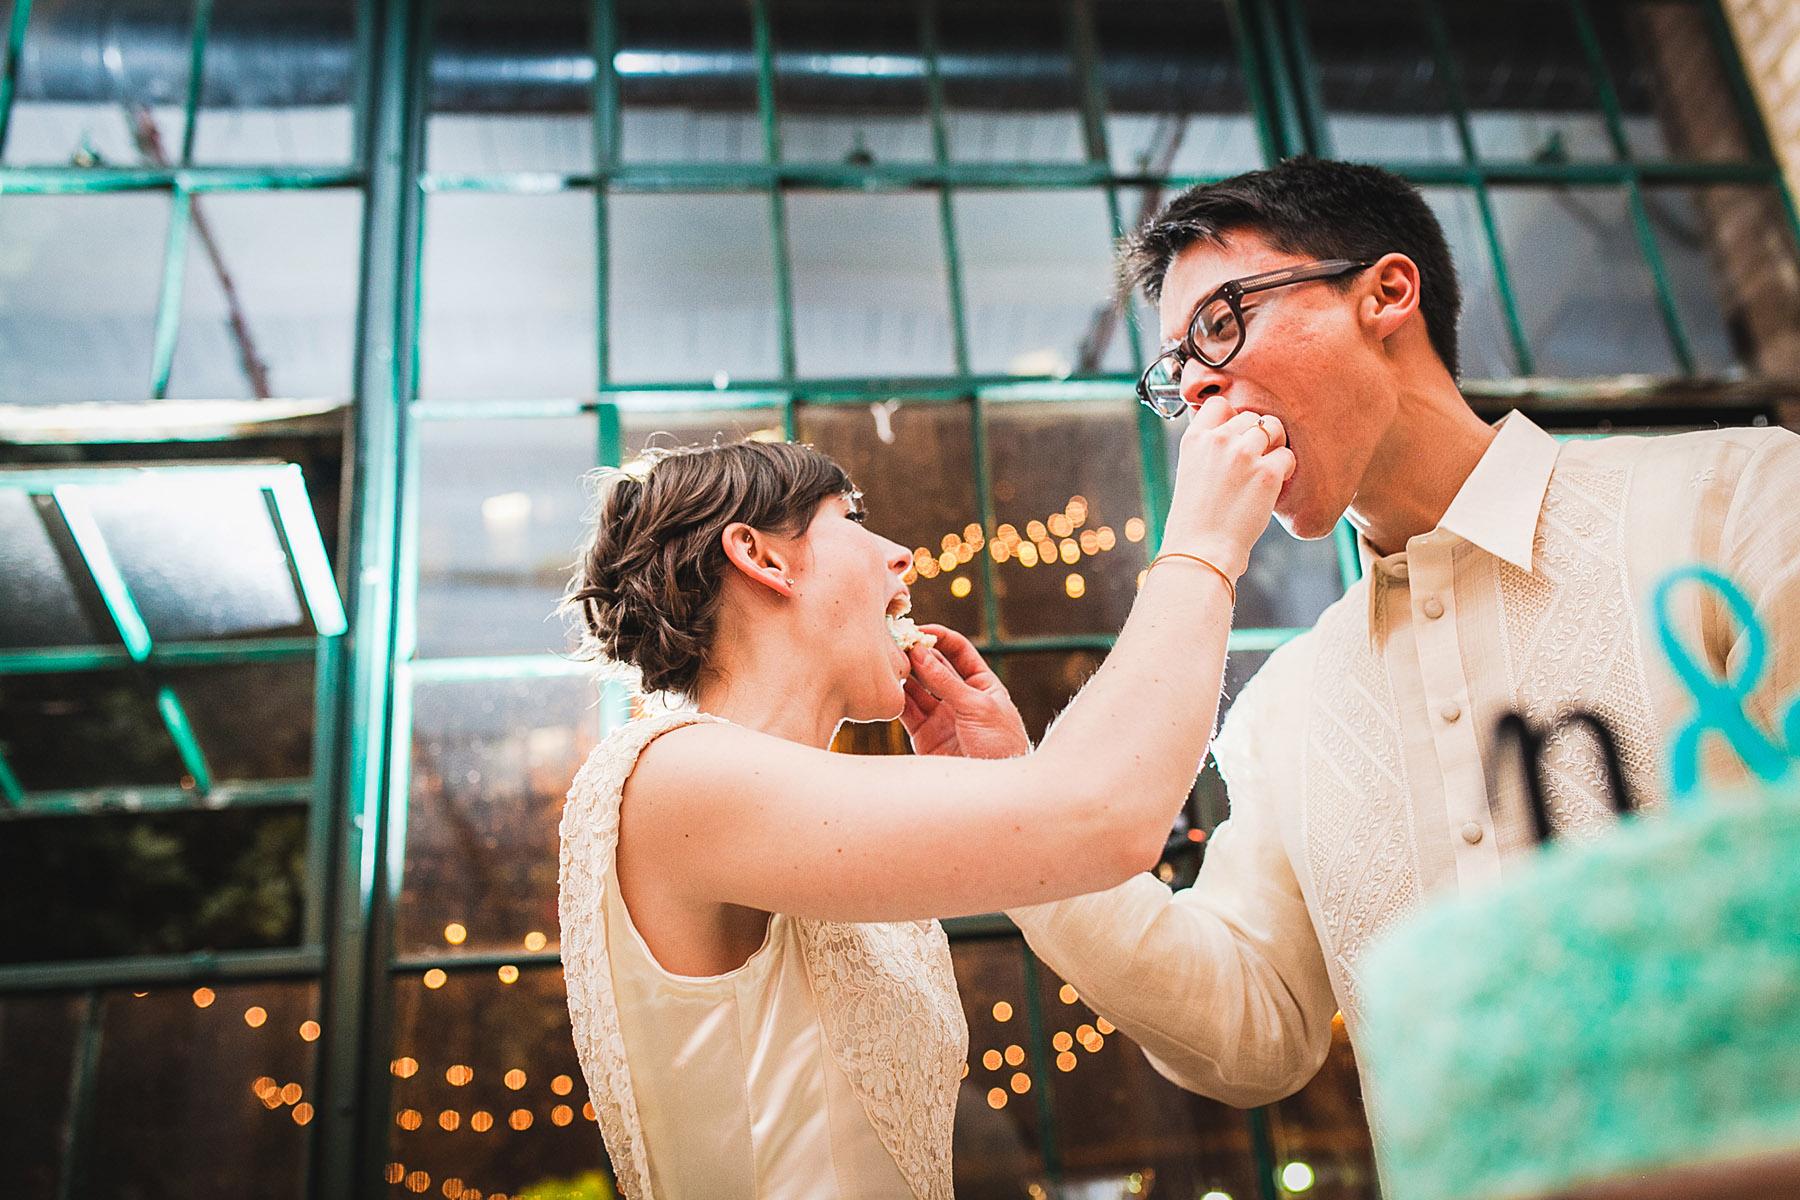 st-hegwig-chicago-urban-arts-society-terrarium-inspired-wedding-documentary-wedding-photography-oriana-koren-67.jpg